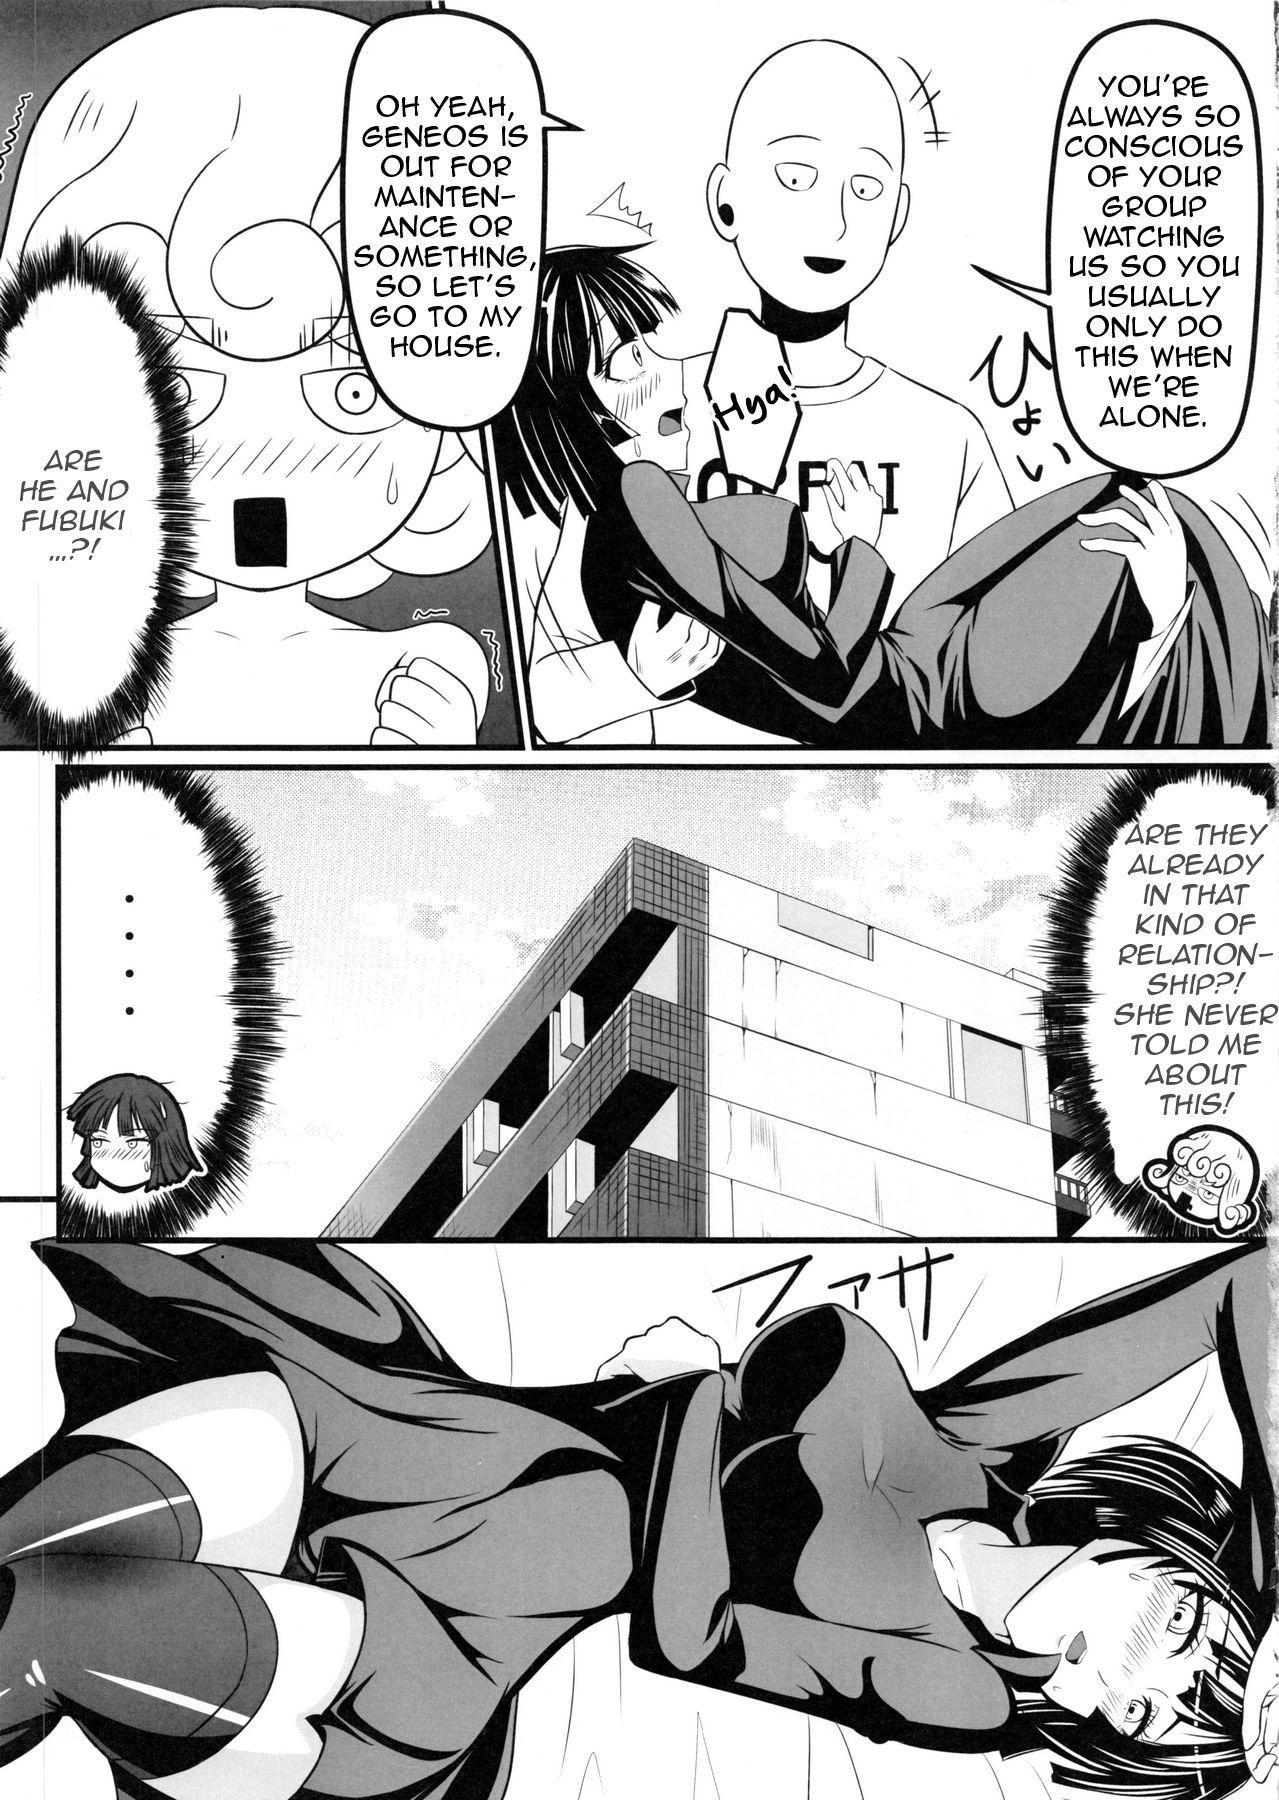 Dekoboko Love Sister 5